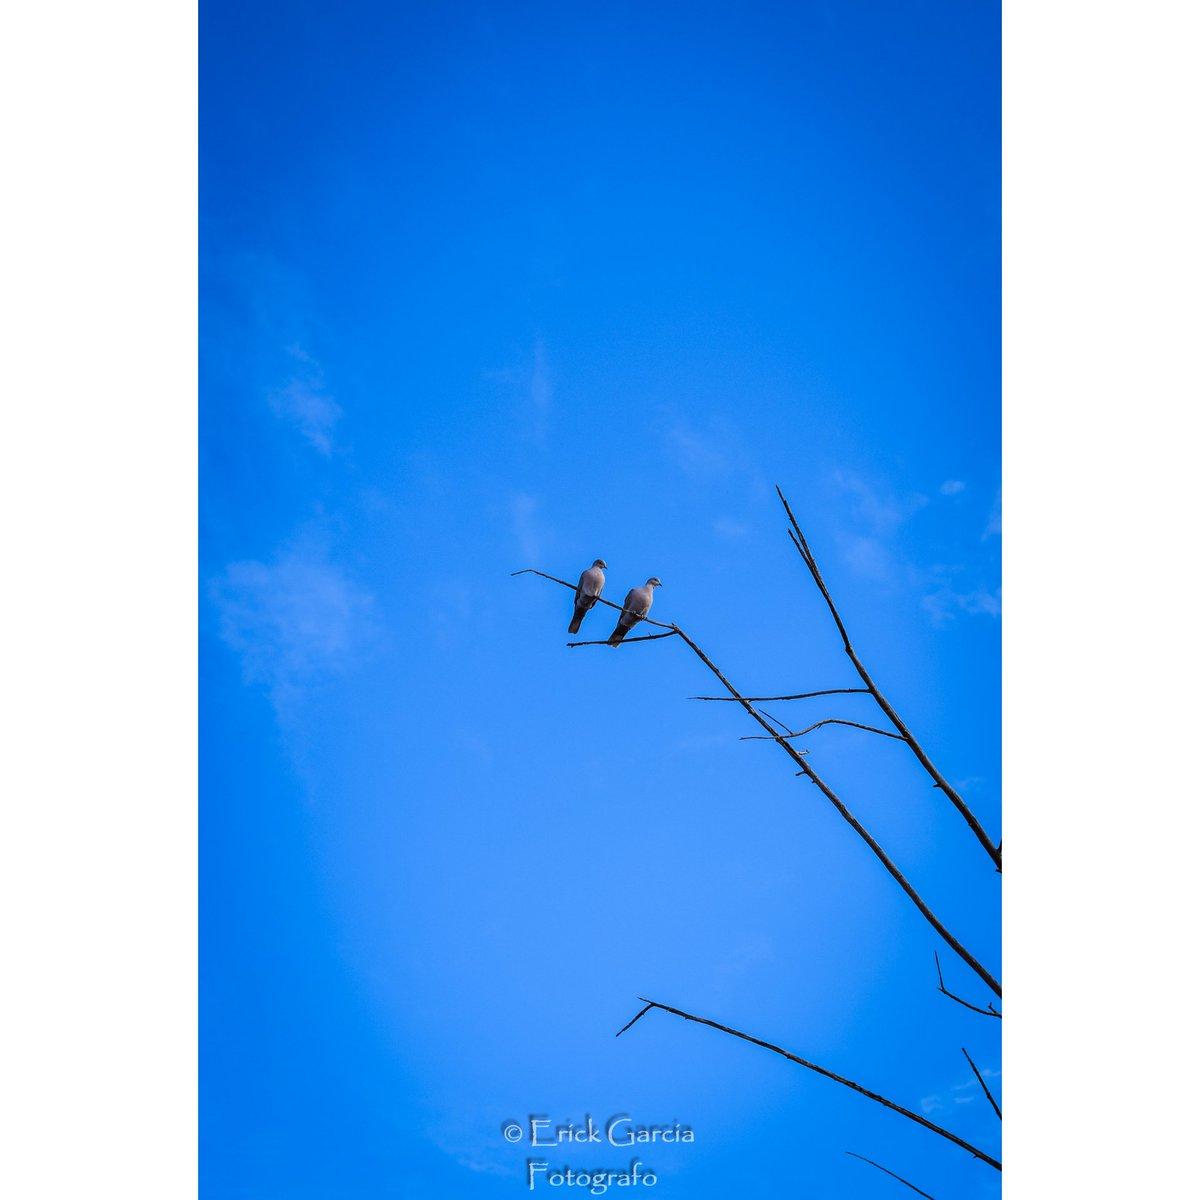 Siempre juntos. . . . . . #nature #nikon #nikonmexico #talentomexicano #mexico #photography #photo #mexicofotos #capturamexico #visitmexico #nationalgeographic #worldplaces #mx #fotografomazatlan #discoverychannel #erickgarciafotografia #mazatlan #sinaloa #hechoenmexico